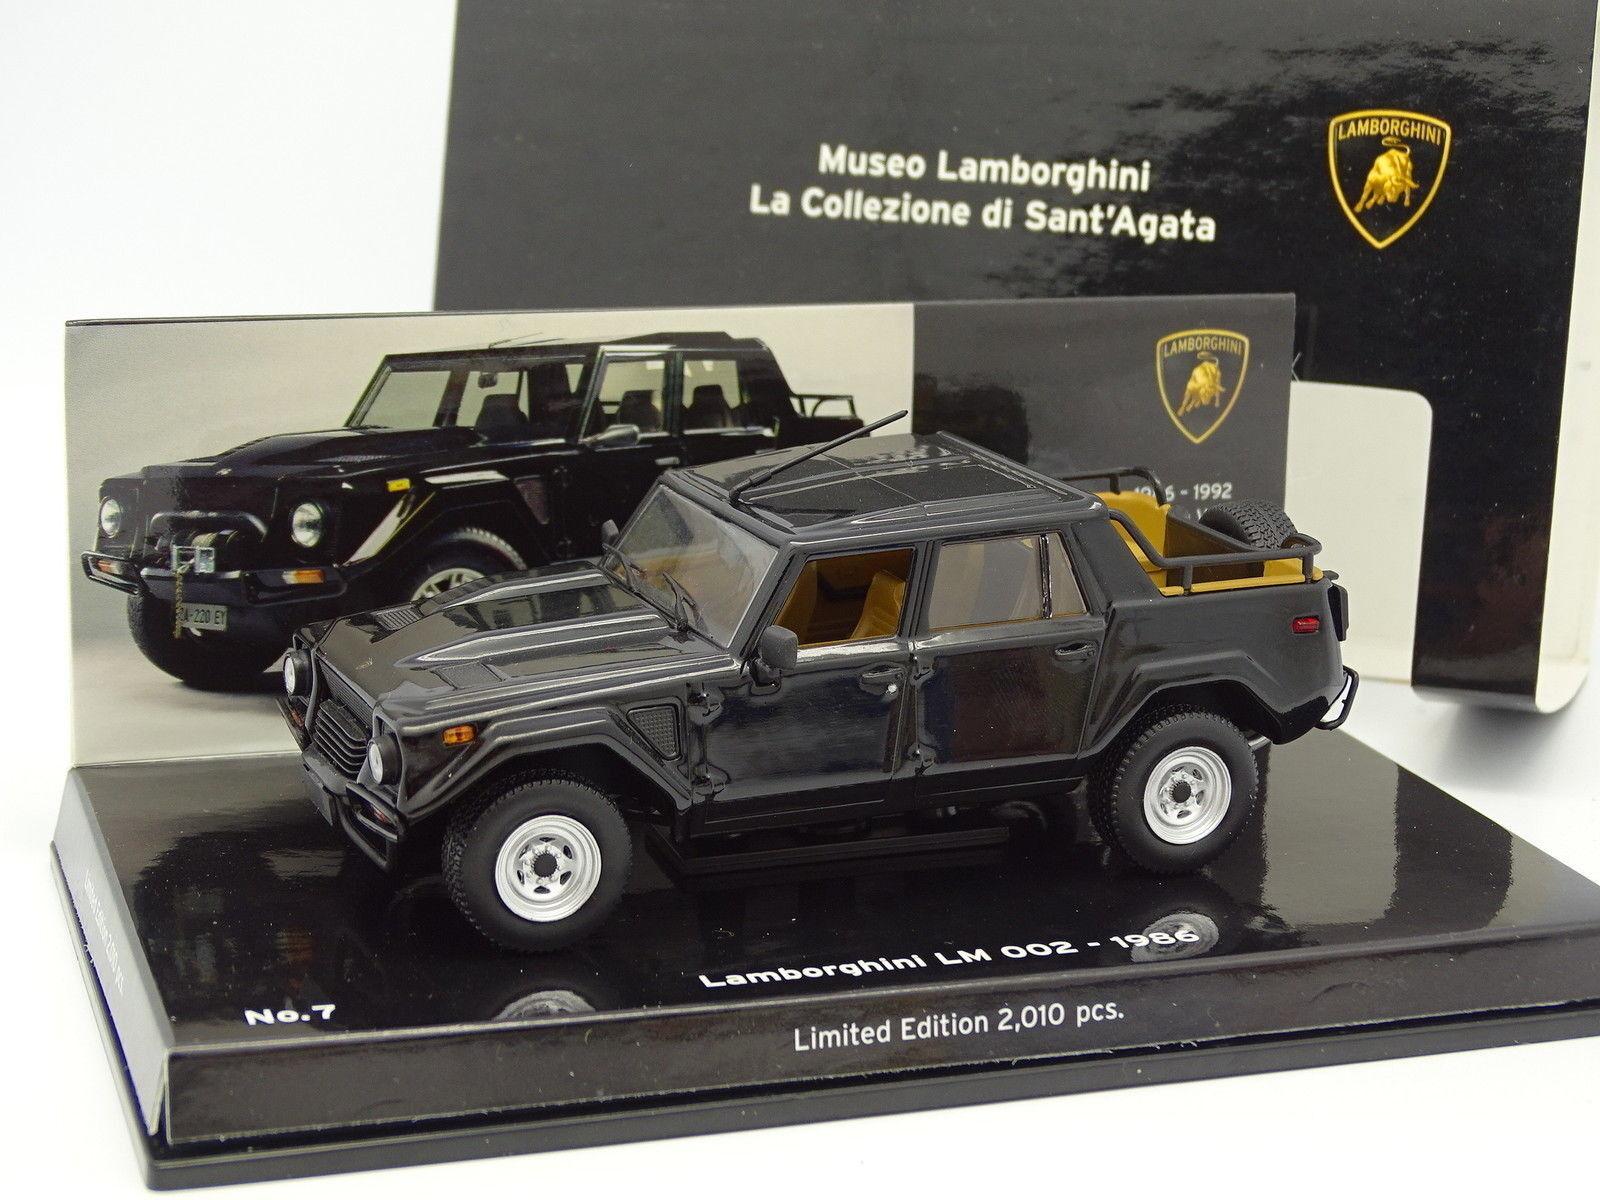 Minichamps 1 43 - Lamborghini lm 002 1986 black